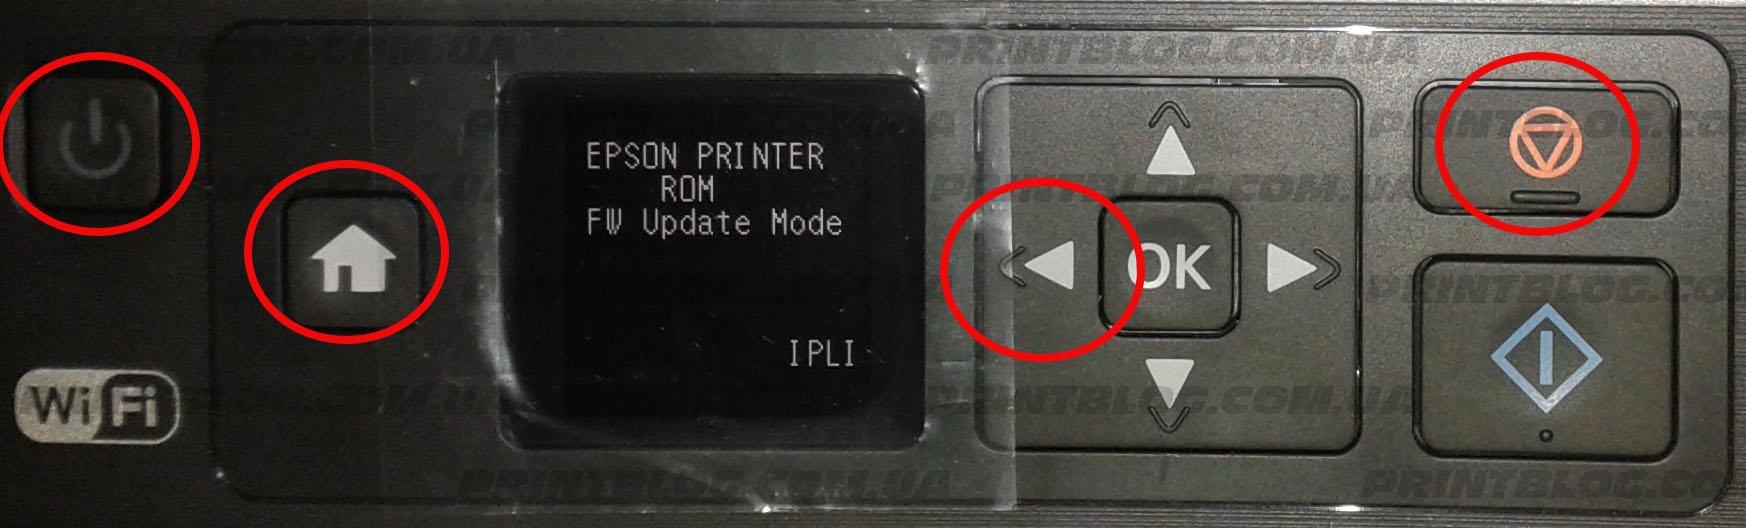 Прошивка Epson XP